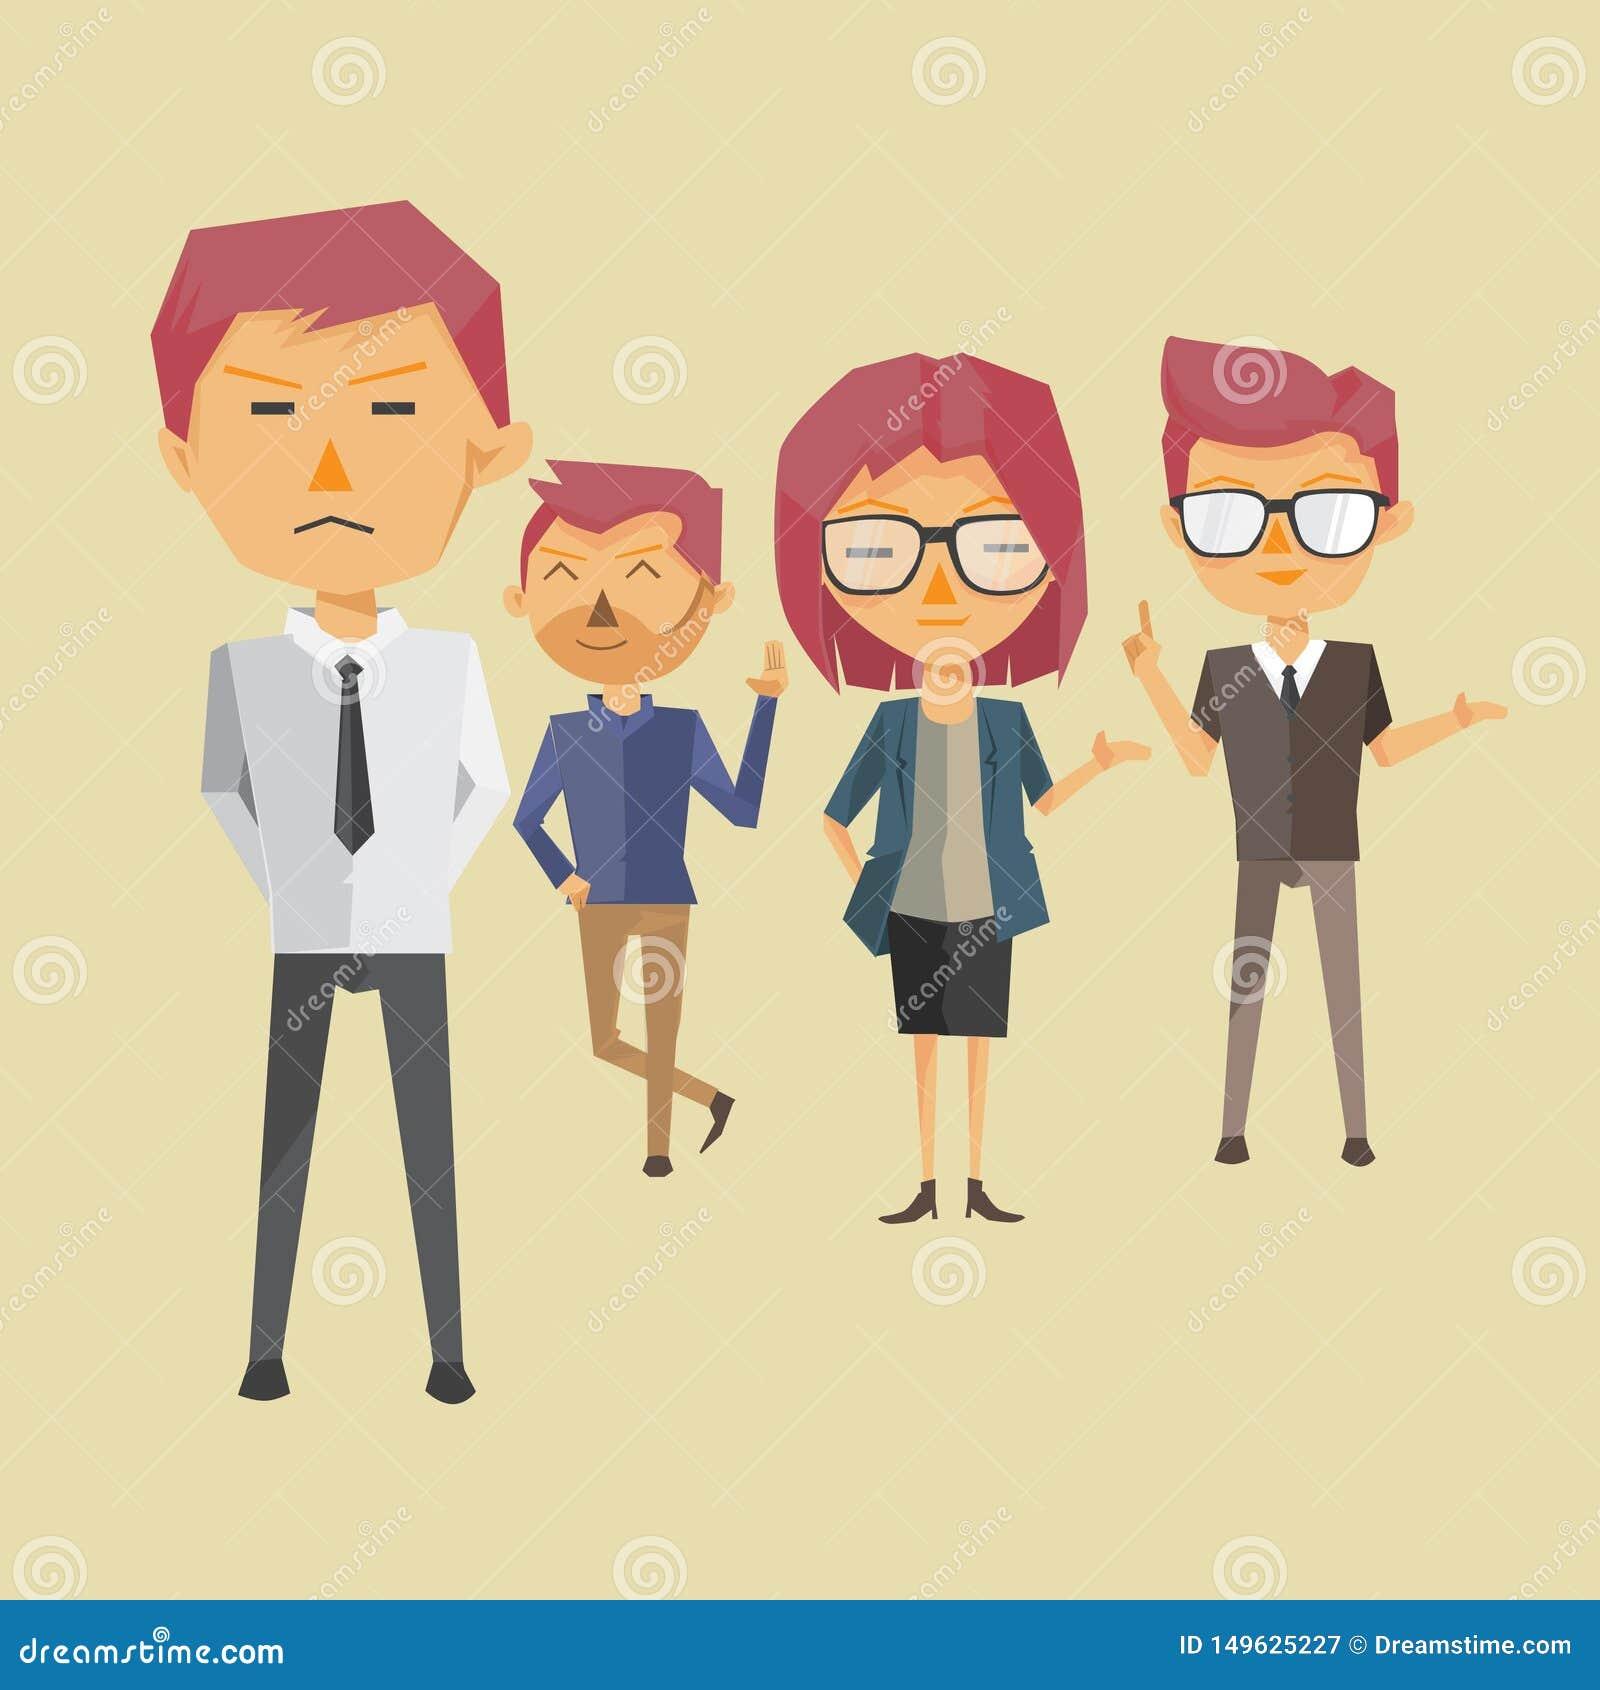 Team Work Profile Illustration Vector